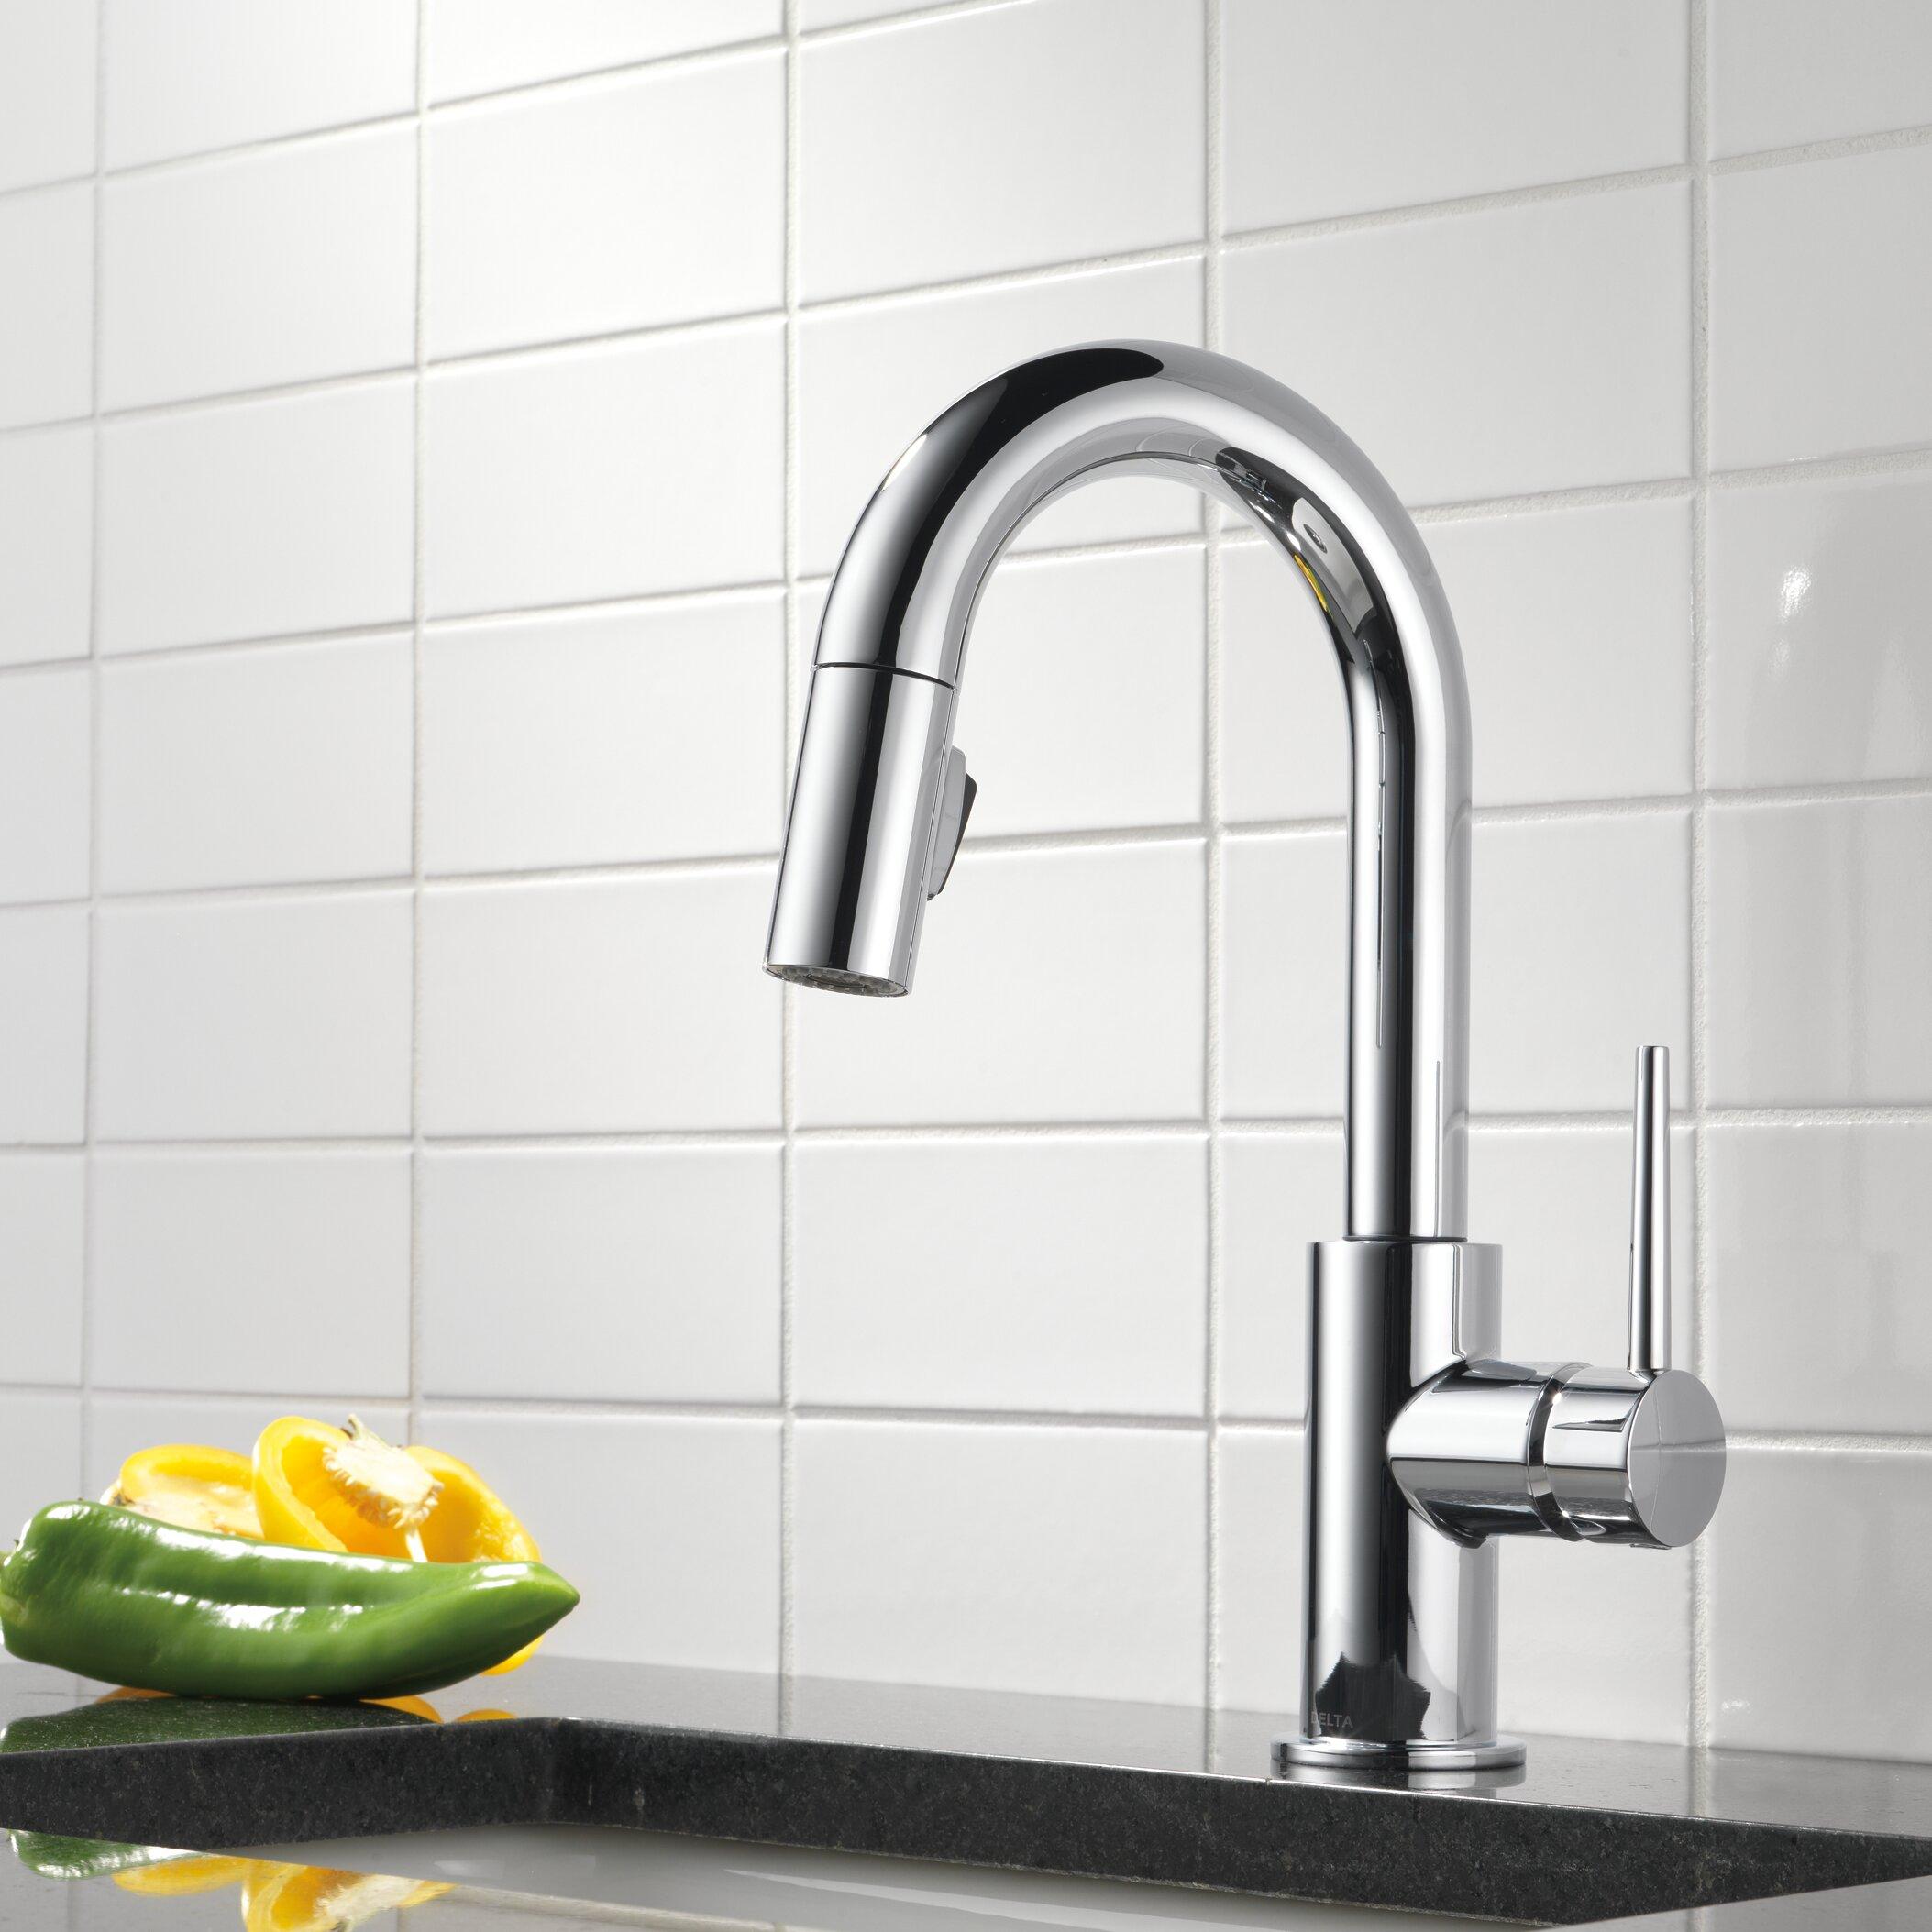 Delta Trinsic 174 Single Handle Deck Mounted Kitchen Faucet